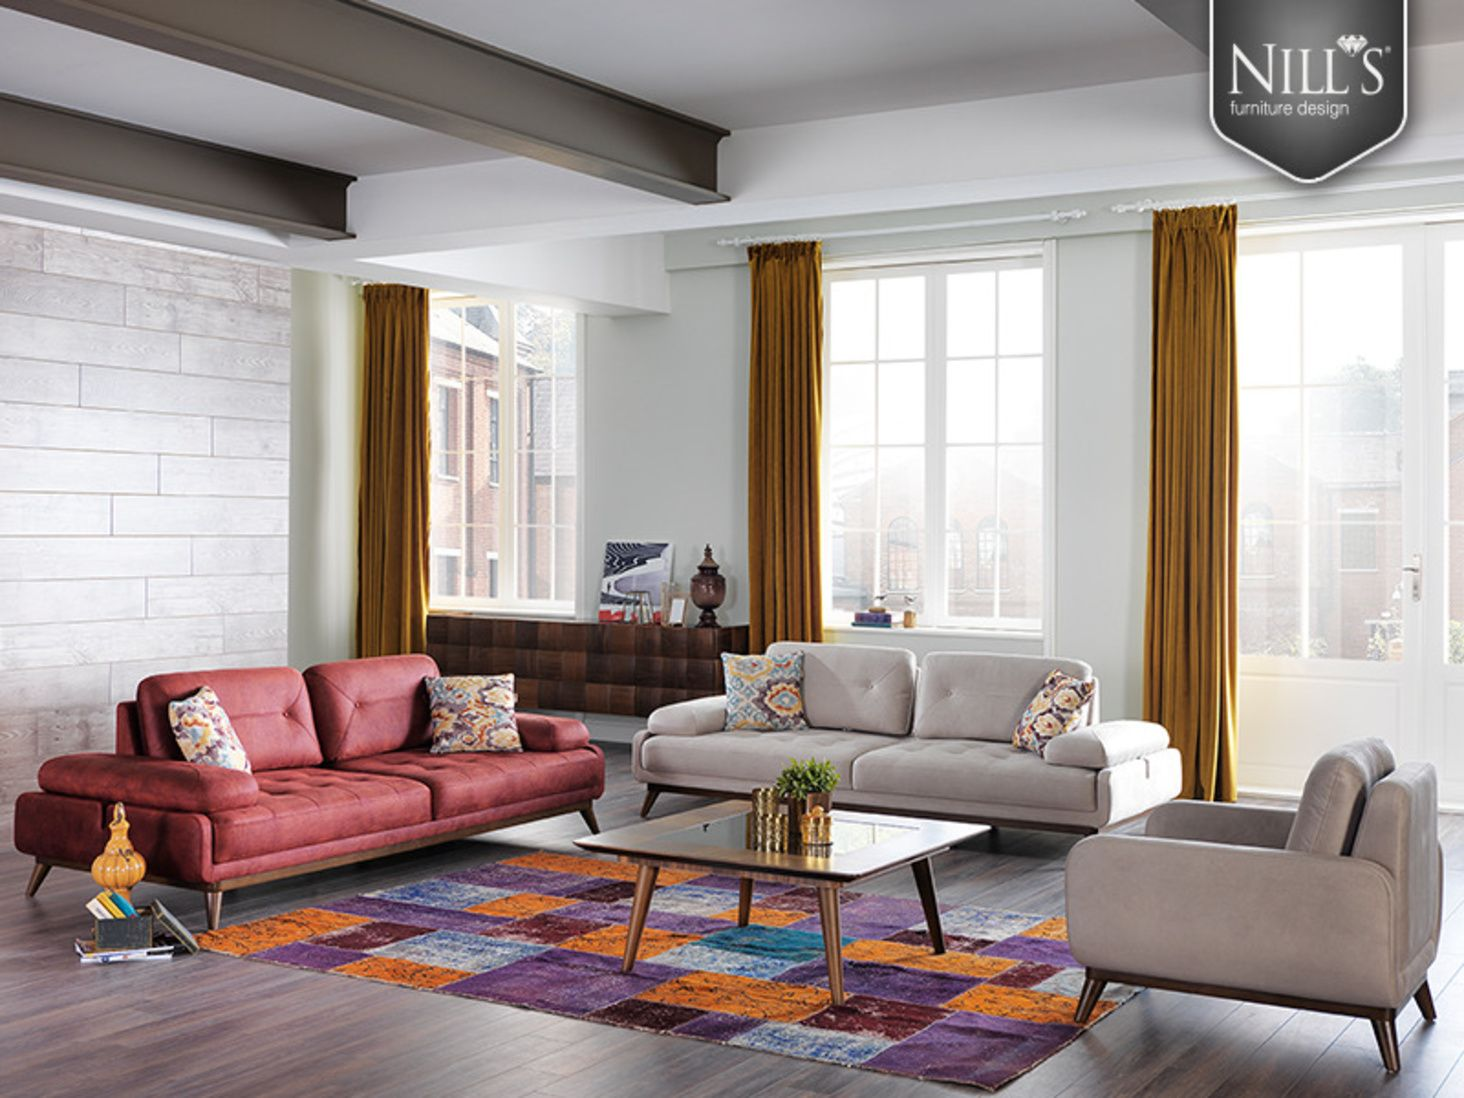 pralinkoltuk hayatina renk katmak isteyenlere yeni koltuk koleksiyon furniture design modern tasarim homestyle homedesi home decor furniture home